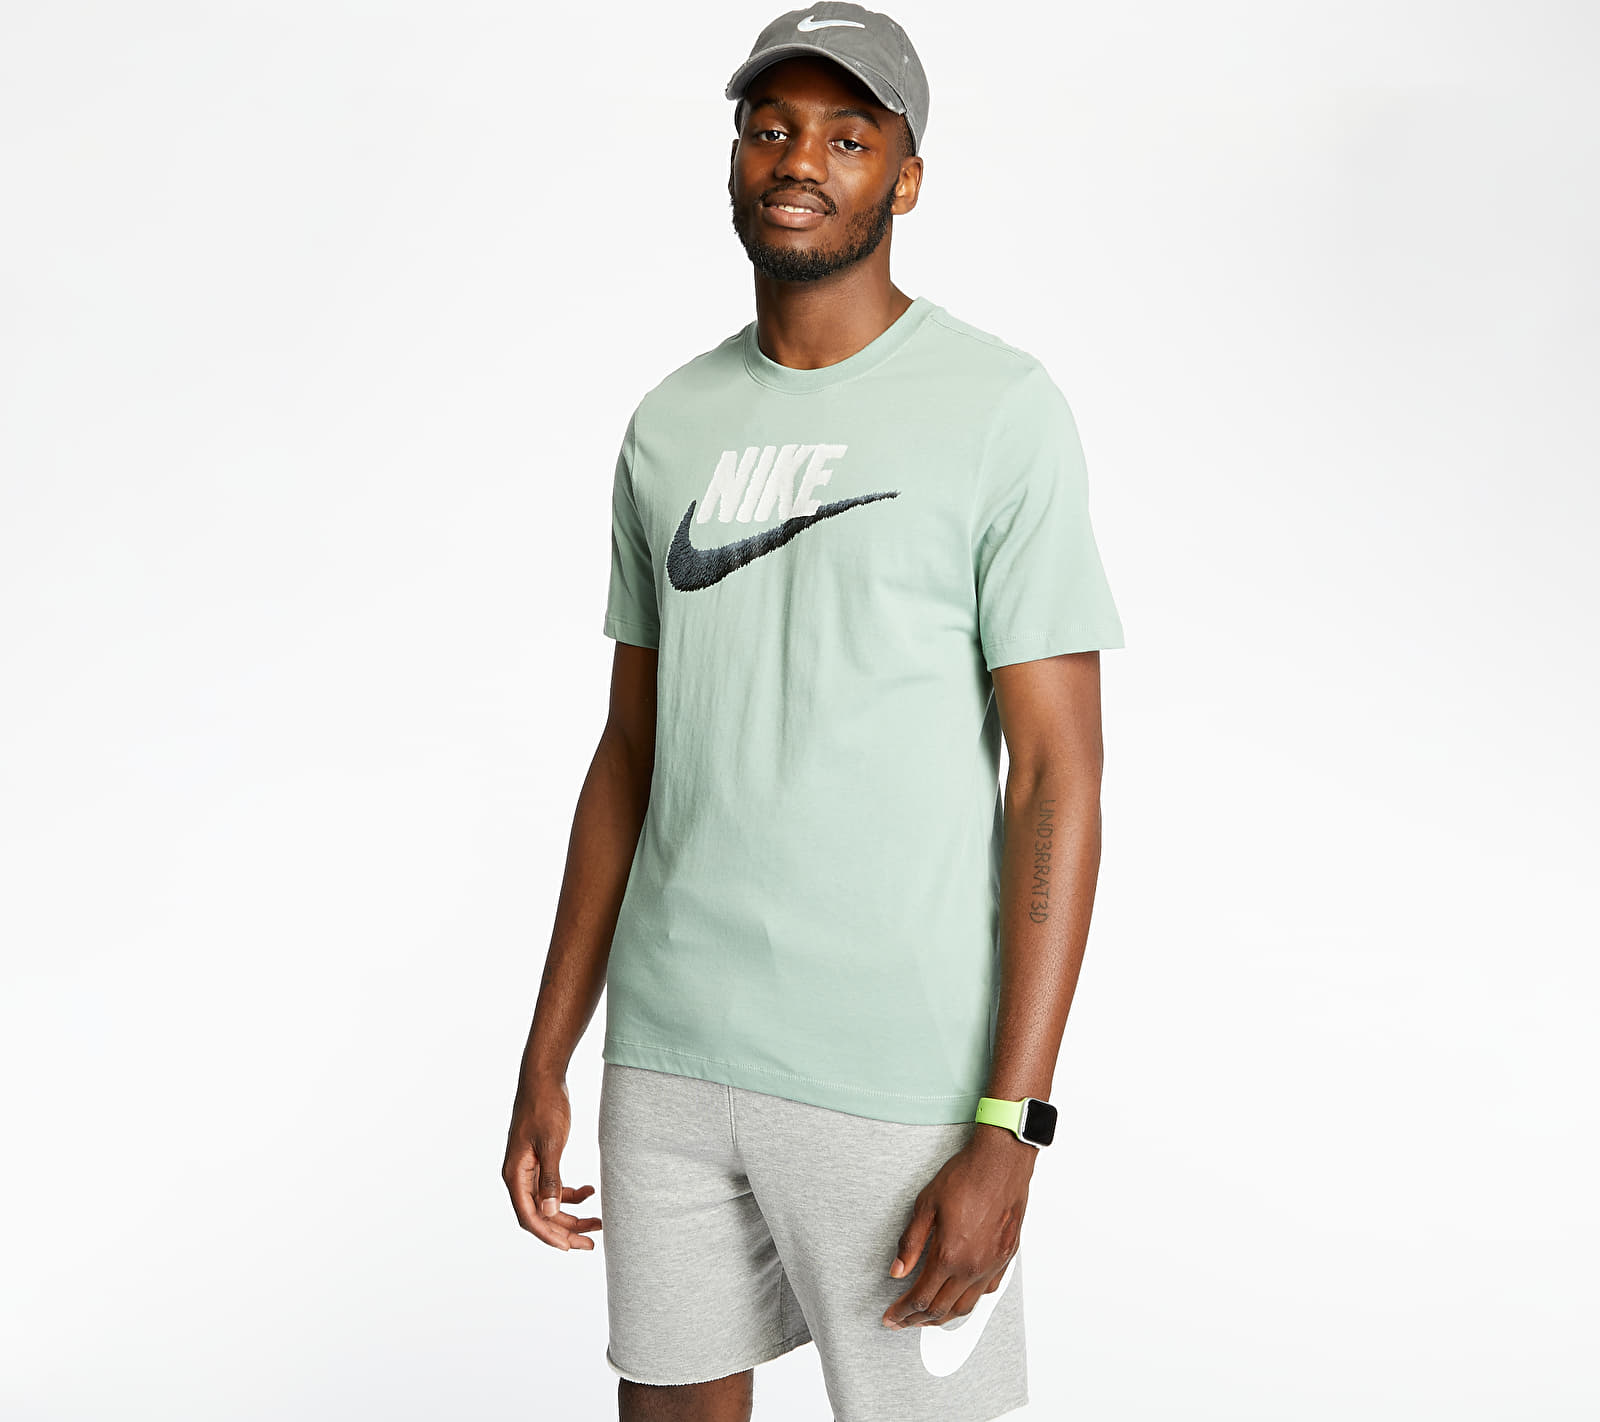 Nike Sportswear Brand Mark Tee Silver Pine/ Platinum Tint/ Black, Green